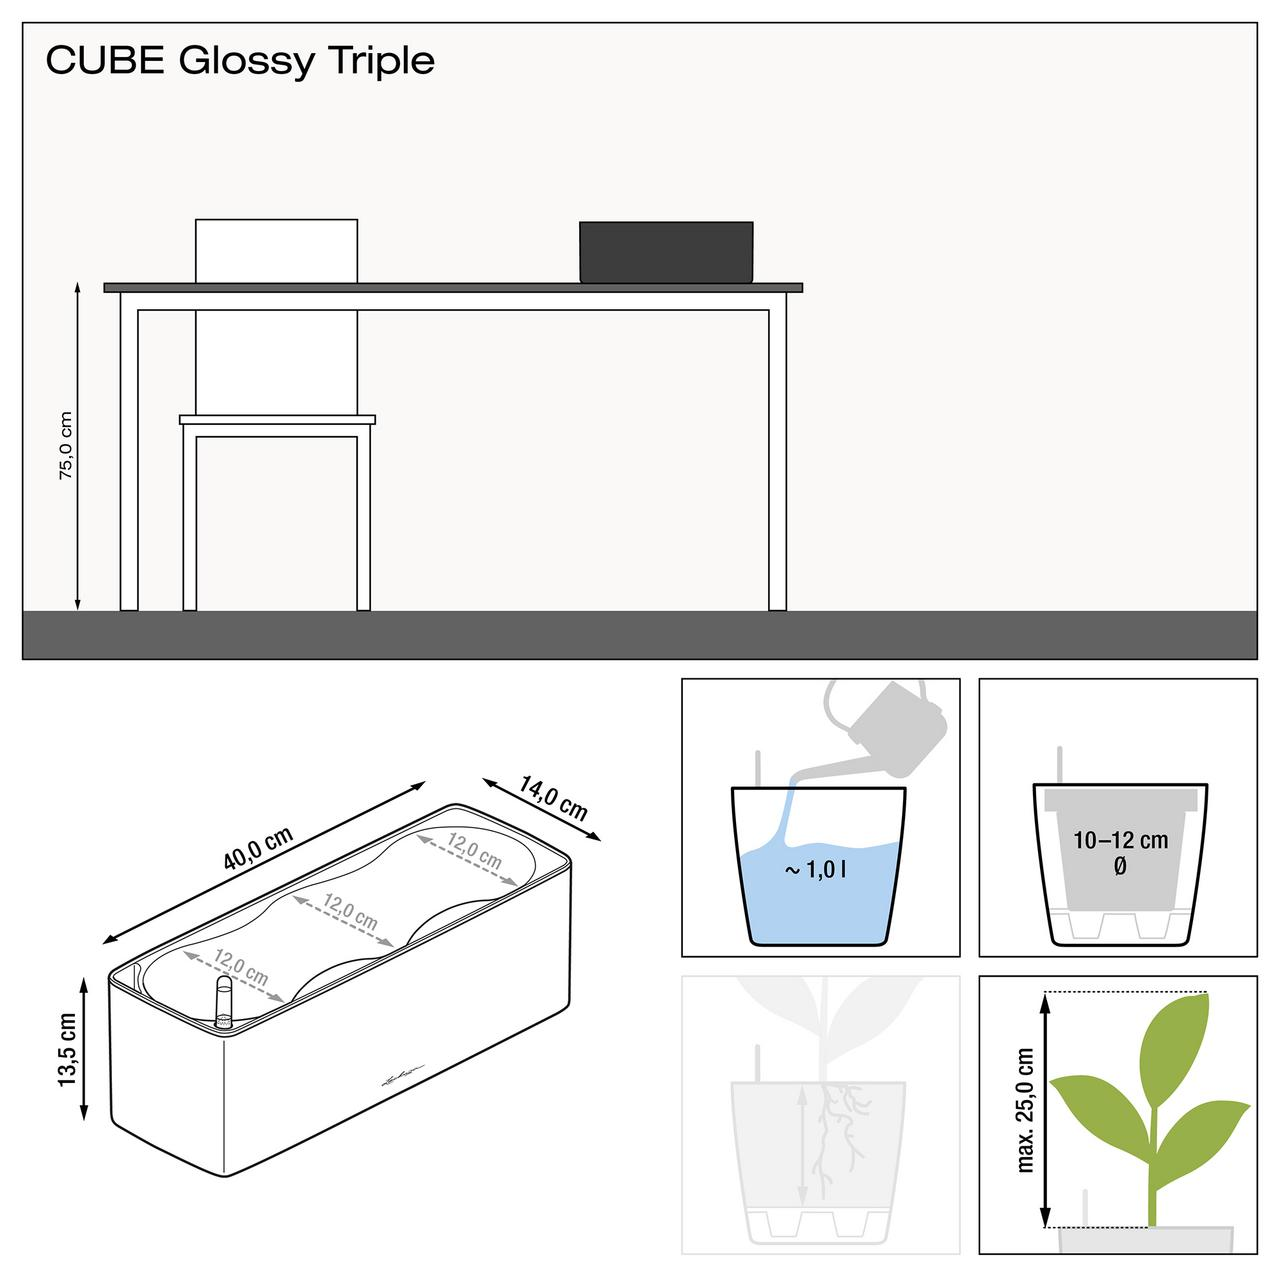 lechuza_cube_glossy_triple